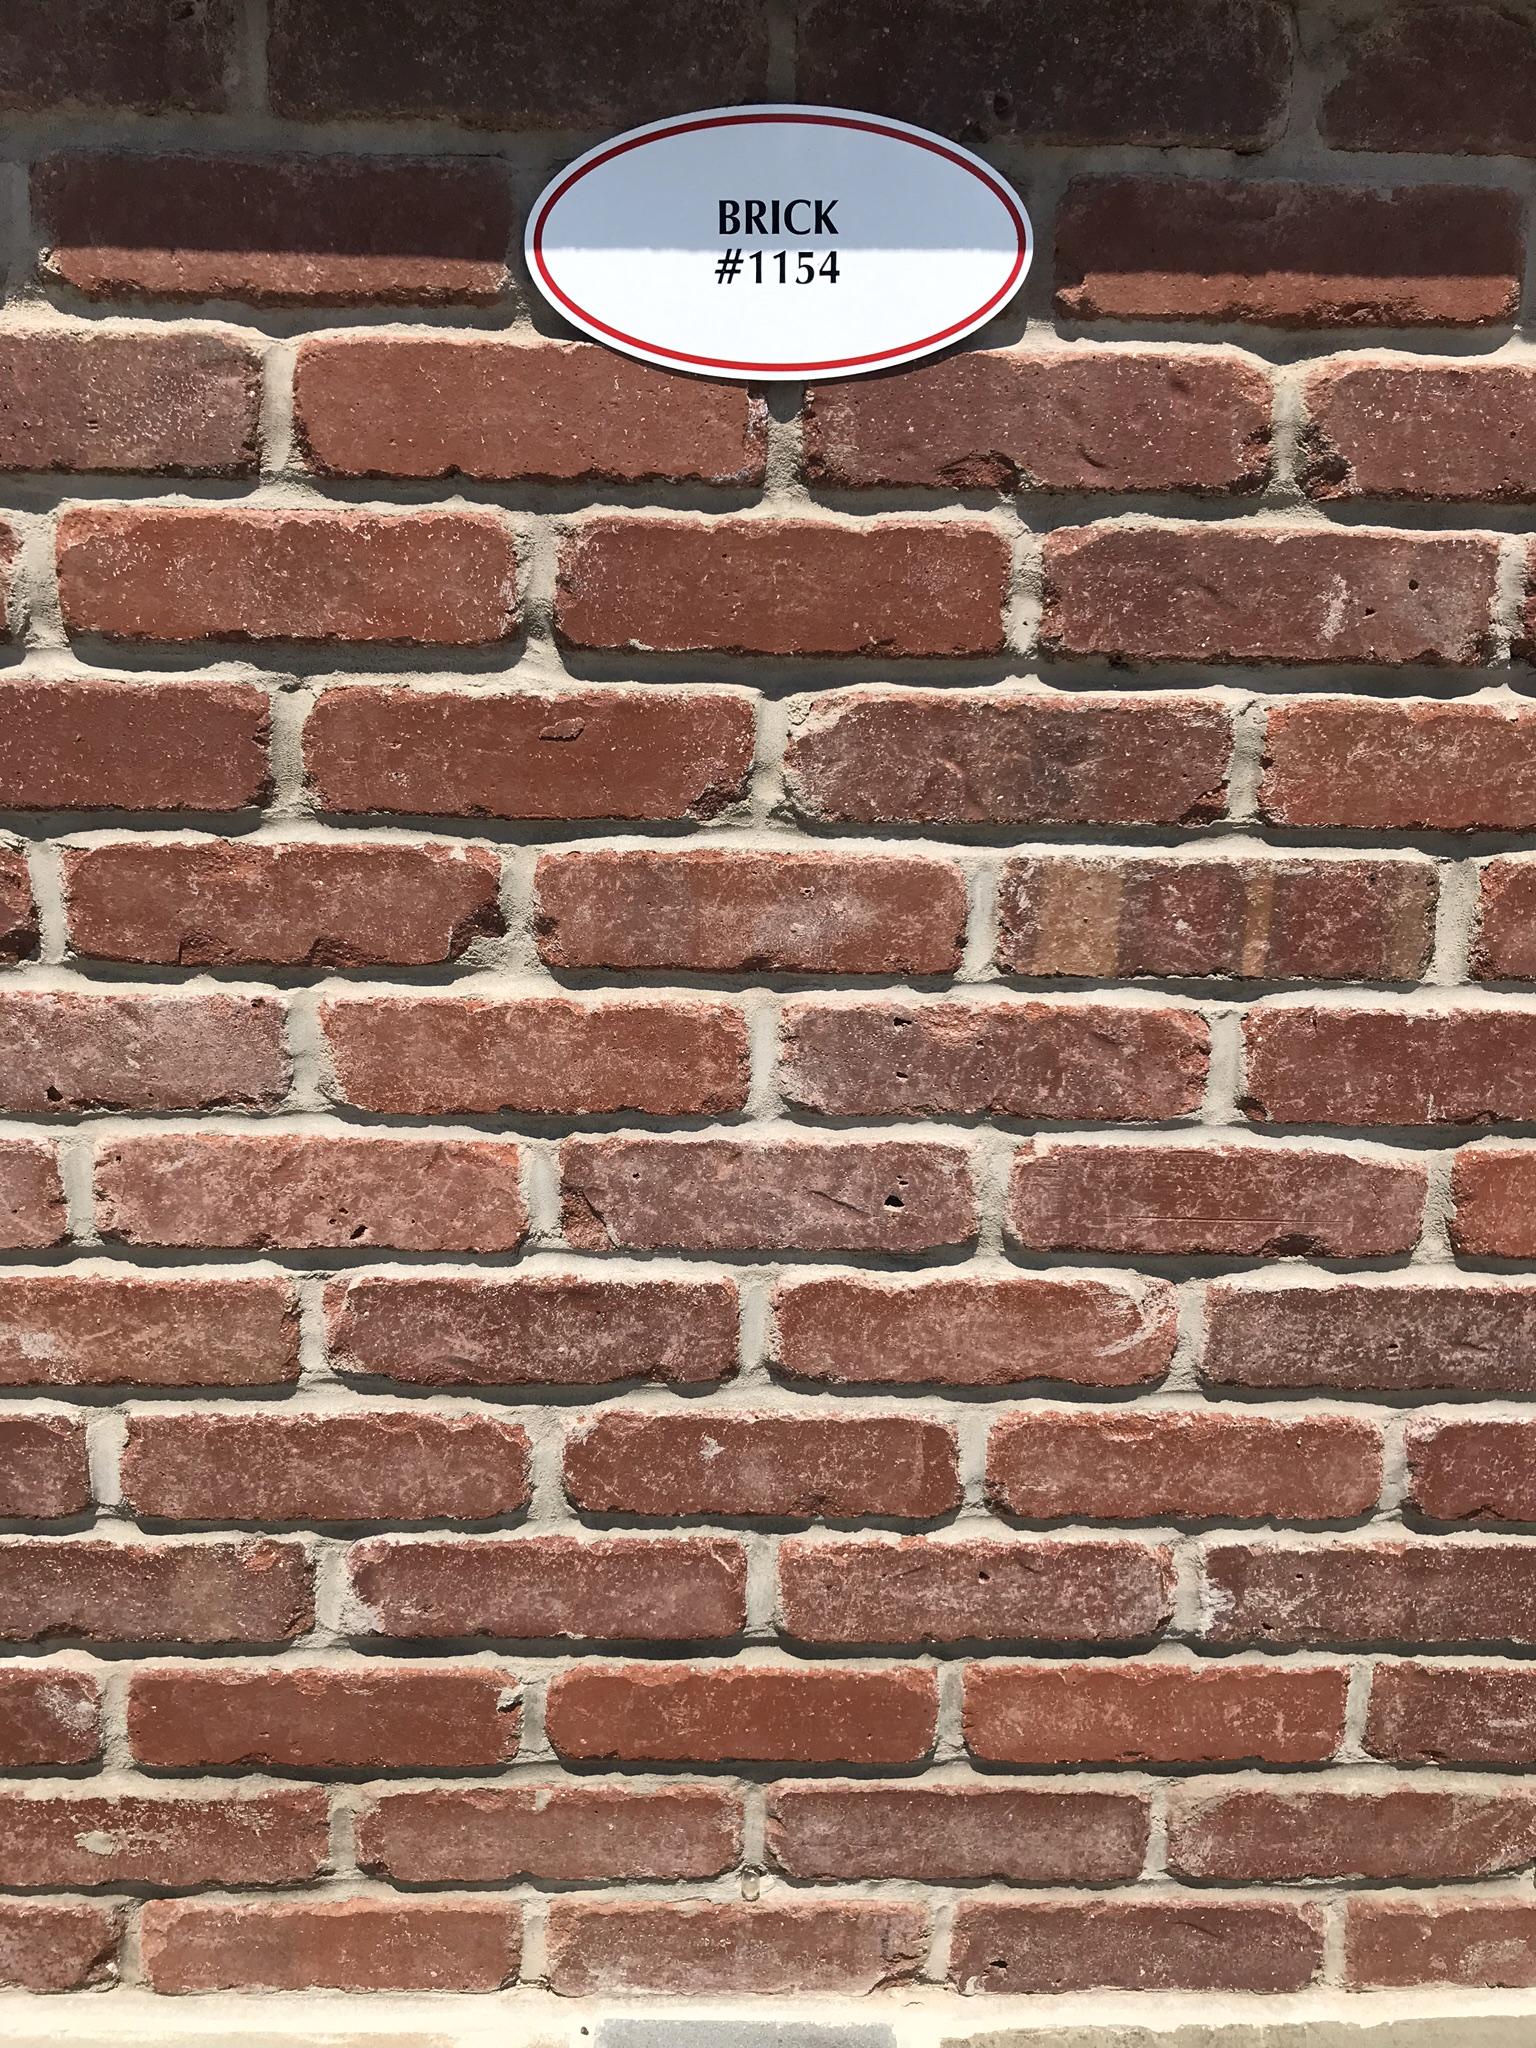 Brick #1154